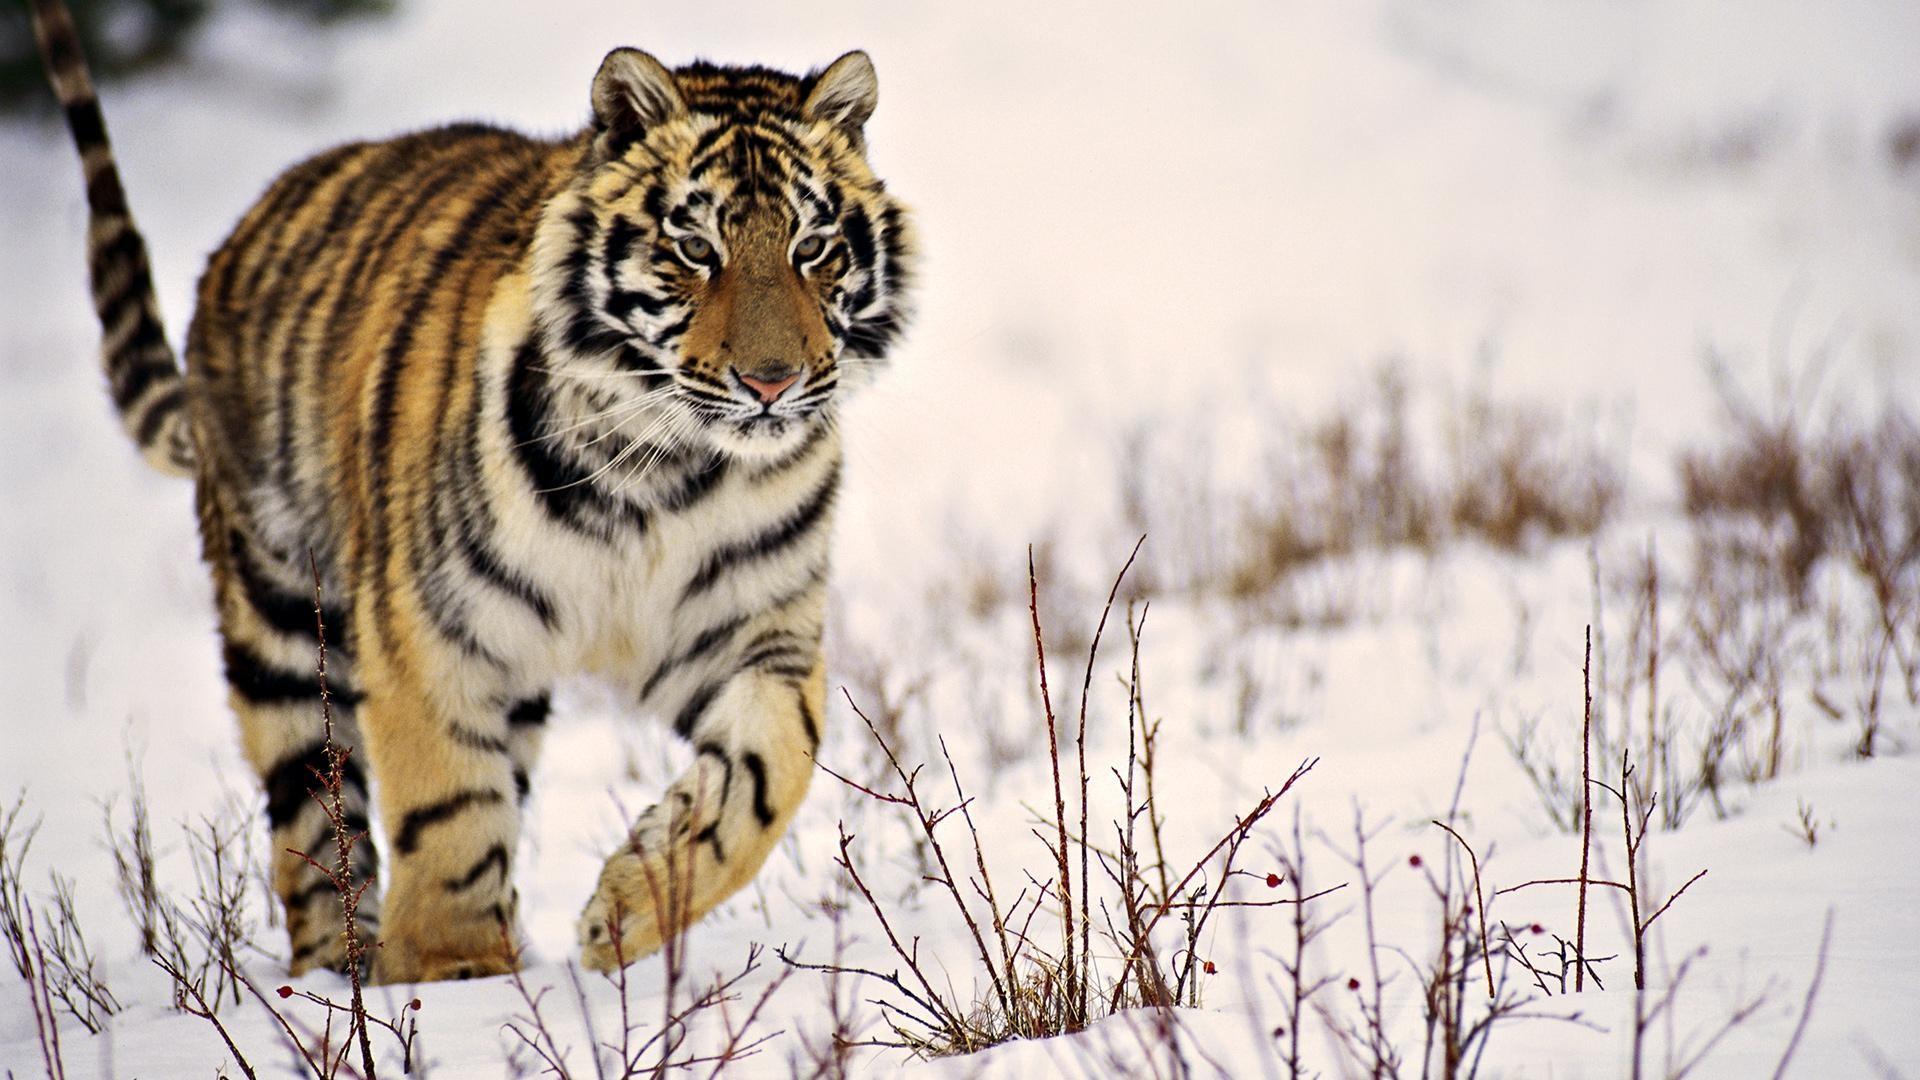 X Tiger Wallpaper Full HD 1280×800 Tiger Wallpapers HD (40 Wallpapers)  